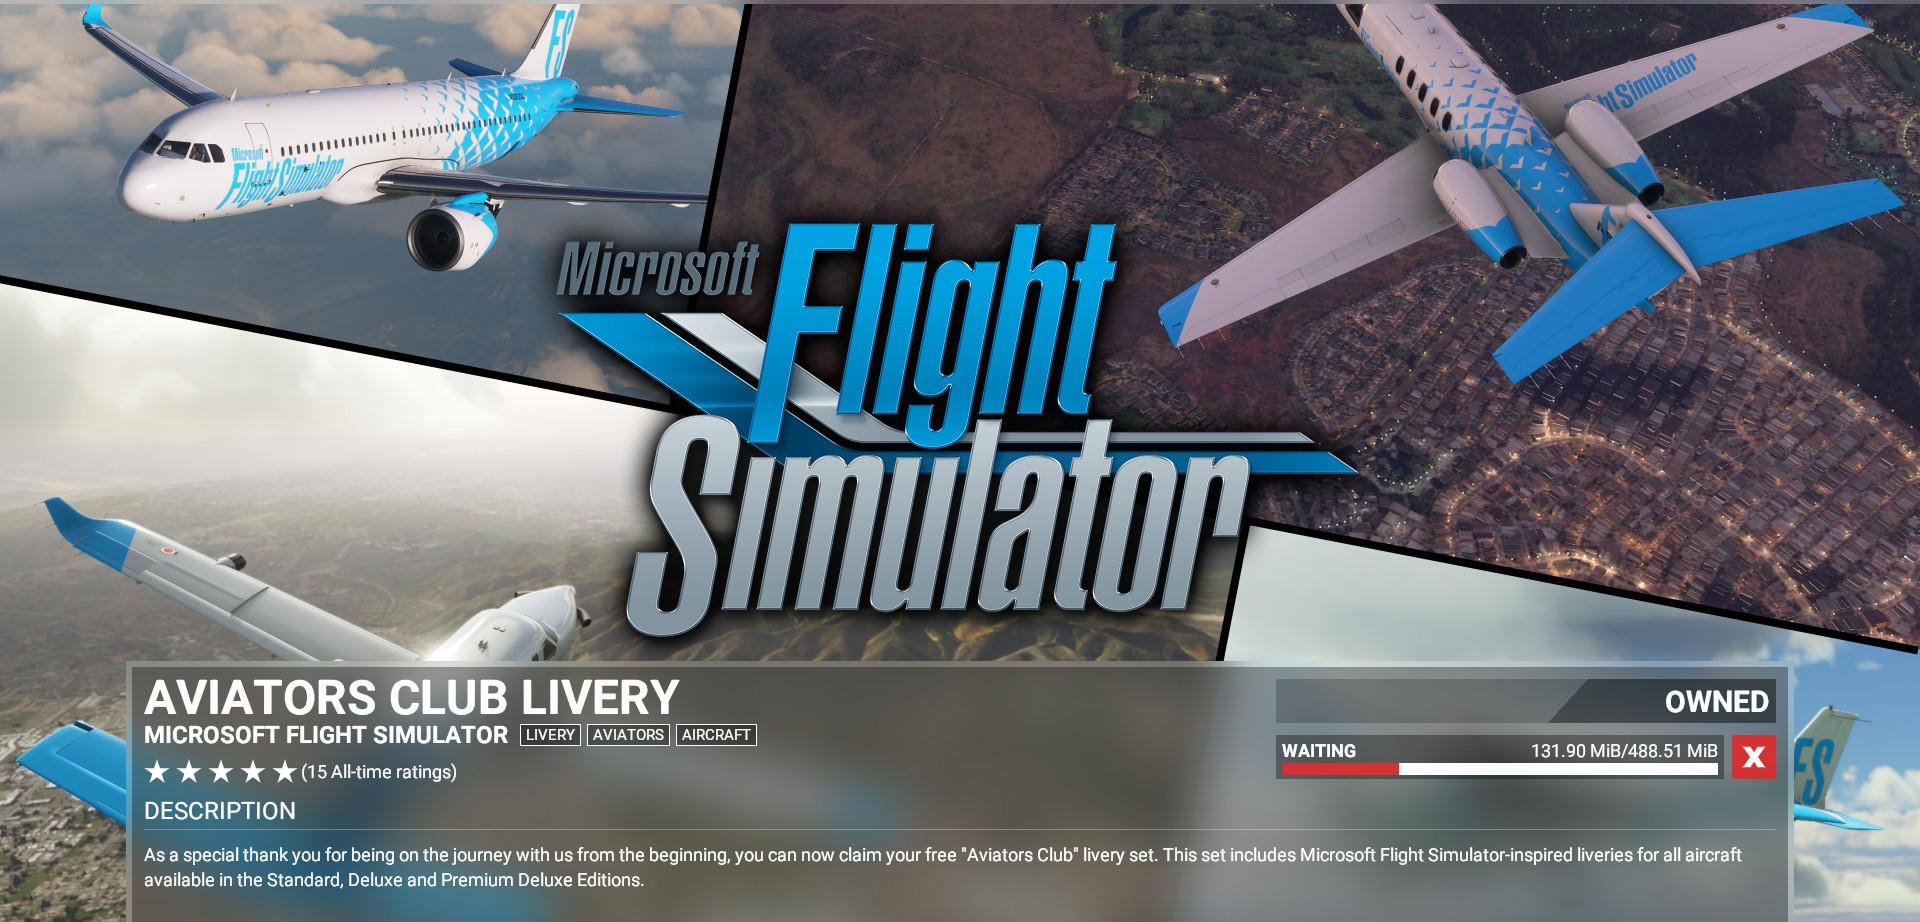 Microsoft Flight Simulator - Aviator's Club Livery